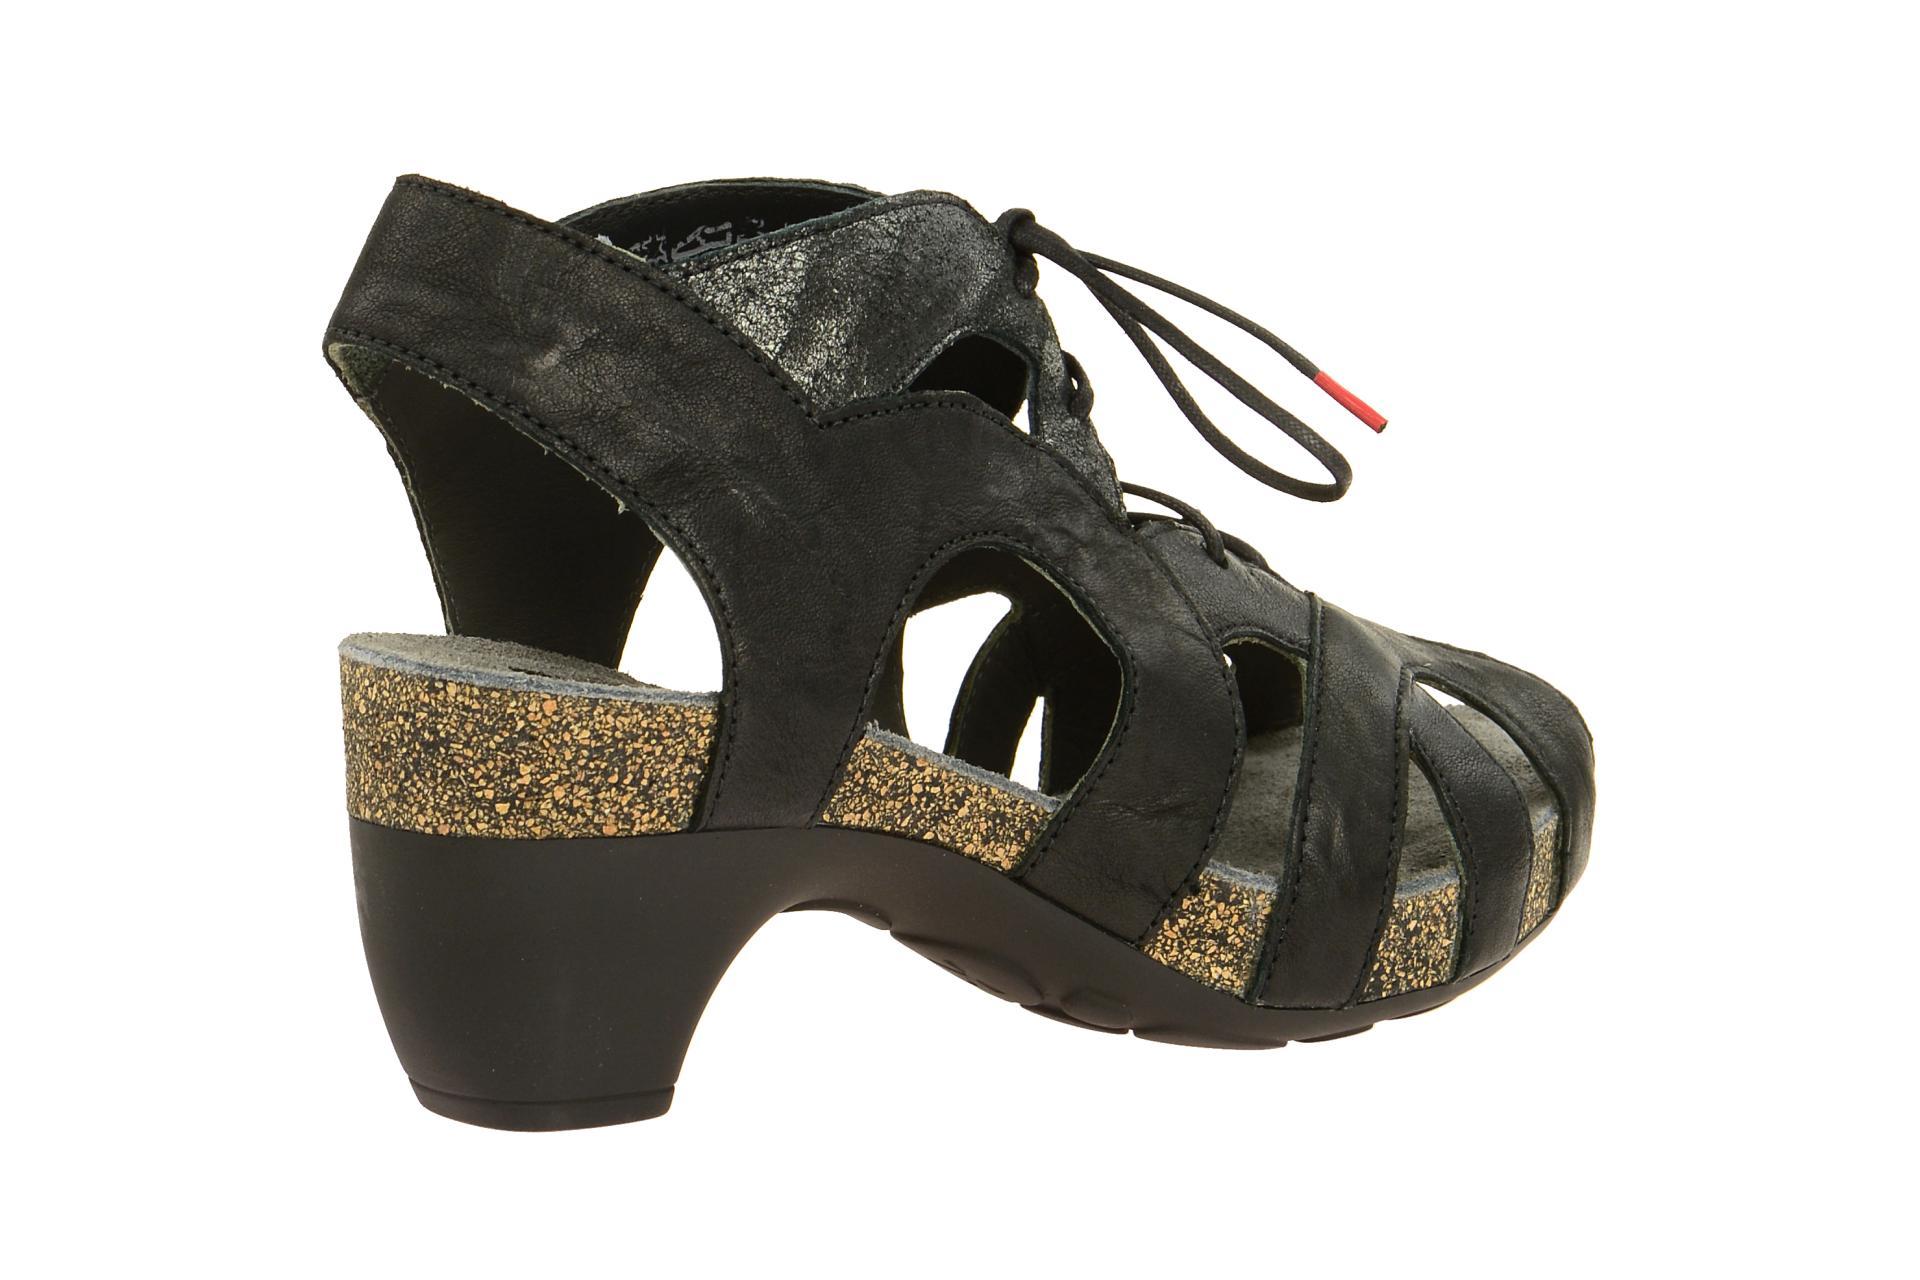 82576 Traudi Think 2 Sandaletten Schuhe Zu Sandale Schwarz Damen Details 09 Neu SzVpUM